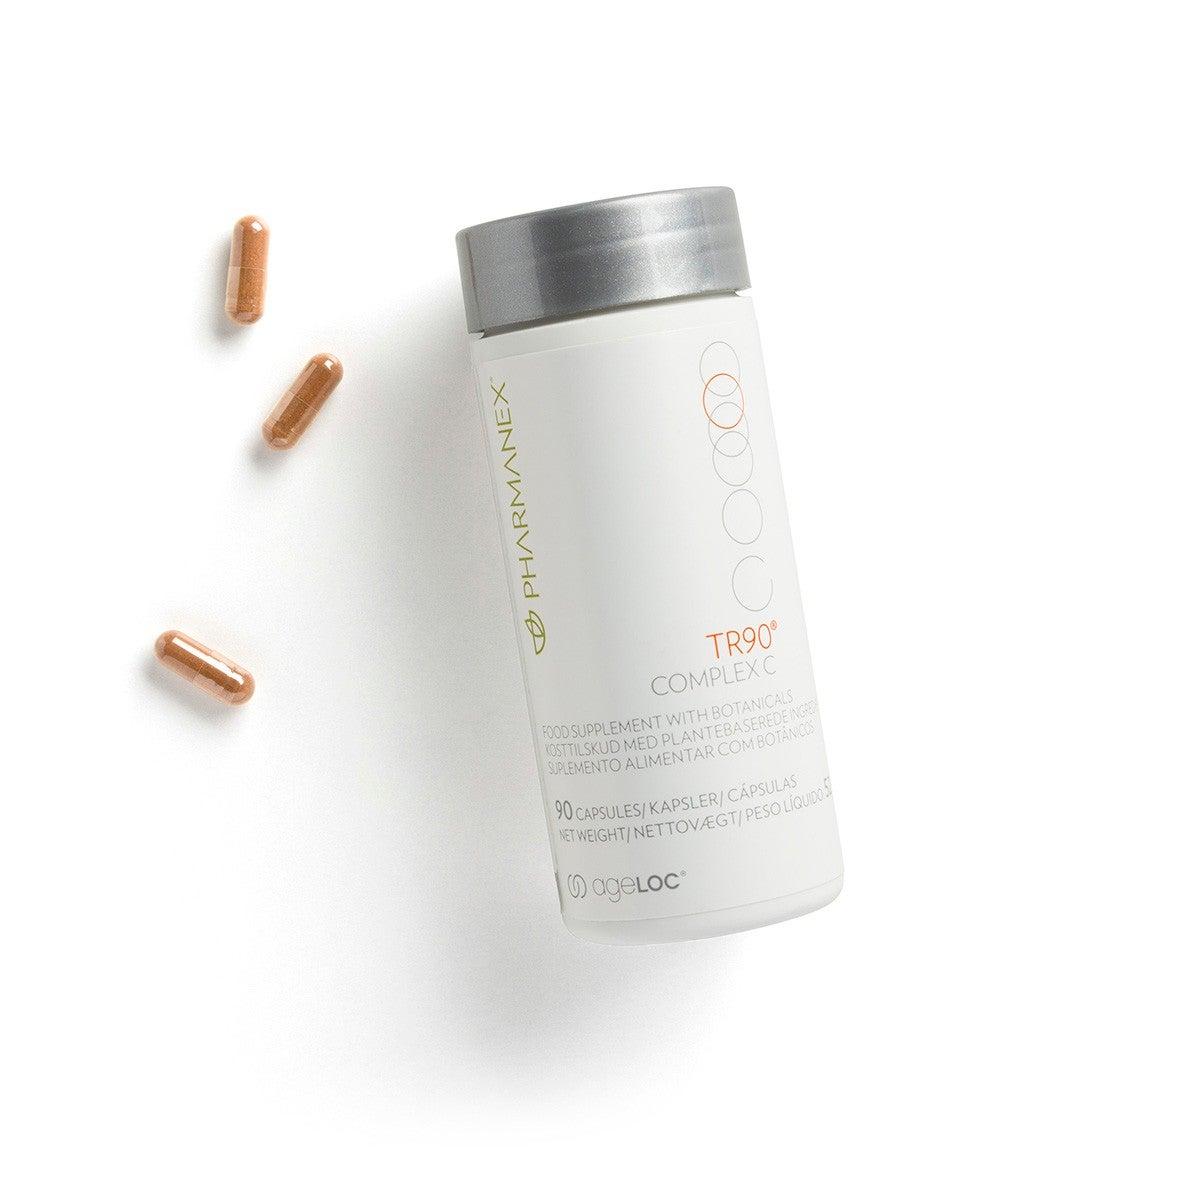 Pharmanex TR90 Complex C pill, sour cherry supplement